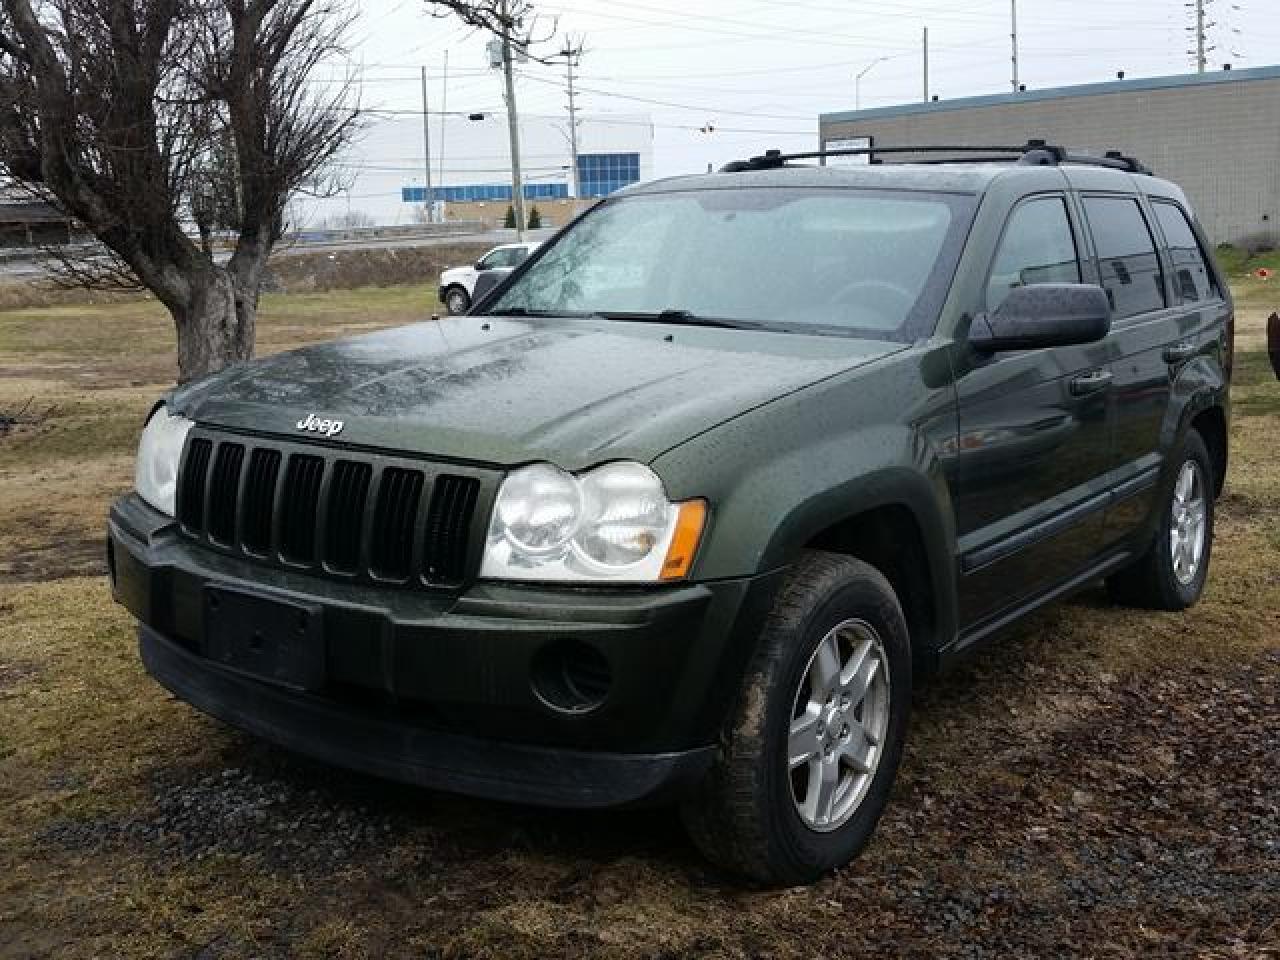 Photo of Green 2007 Jeep Grand Cherokee